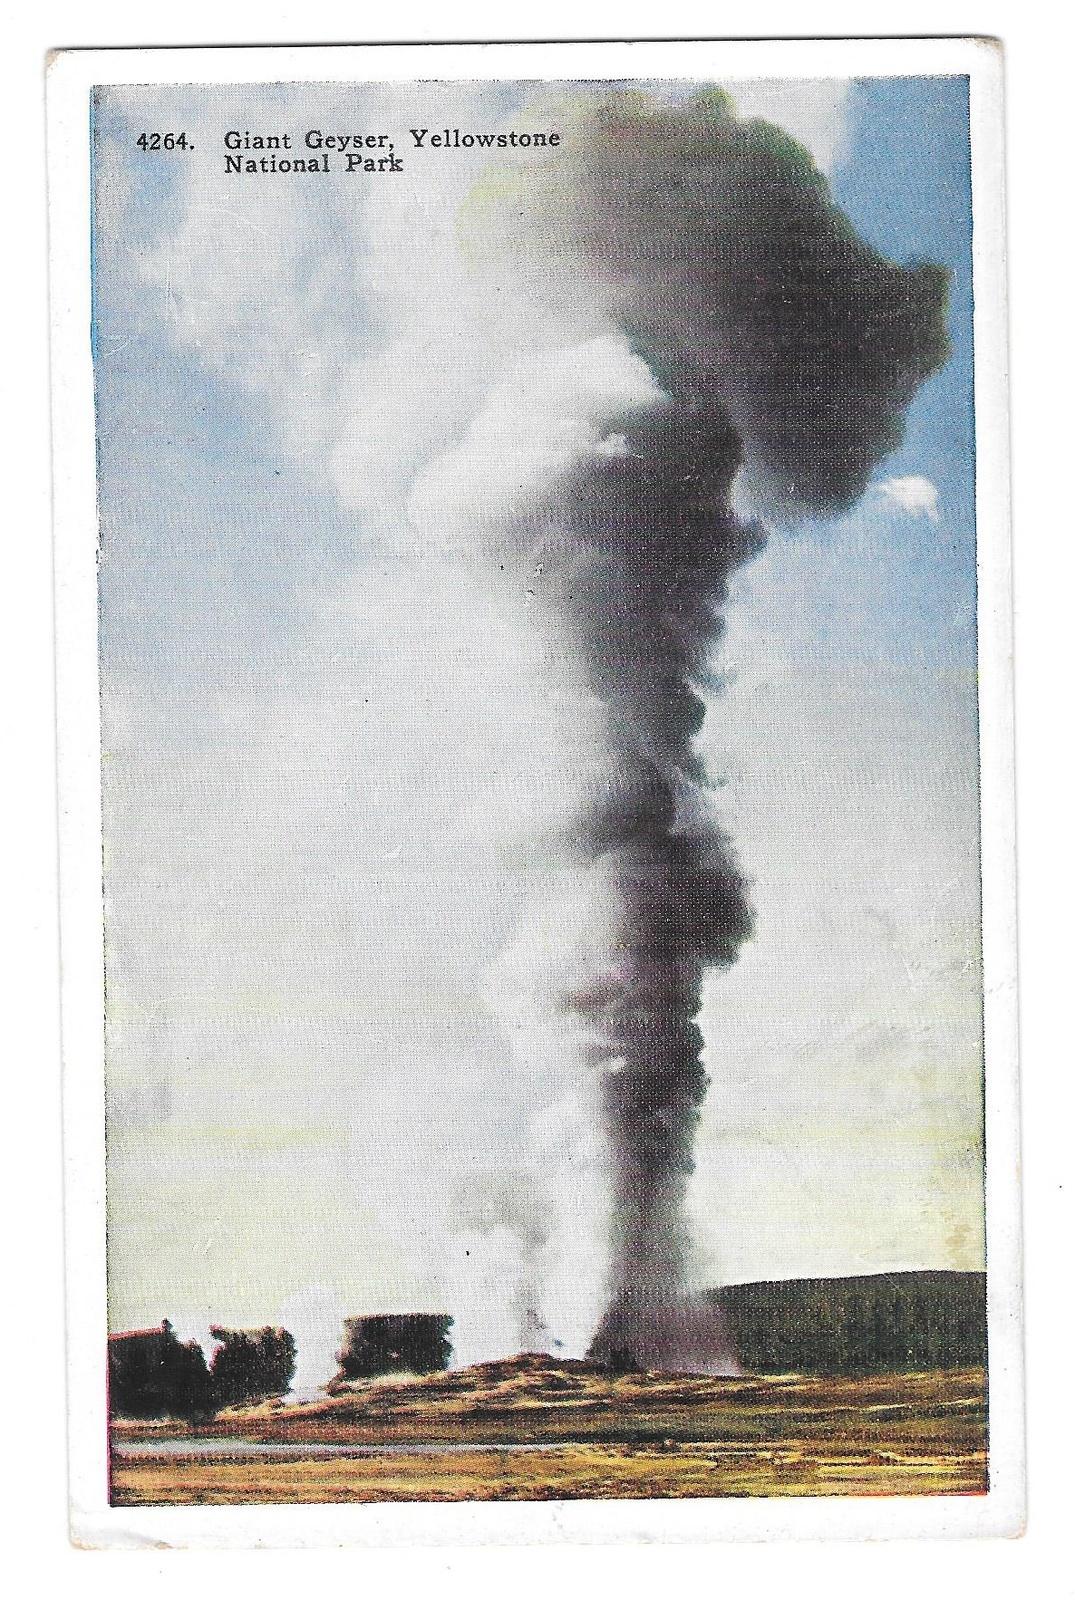 99 br 1925 1bx wy yellowstone giant geyser 13063 soil ll tip crease